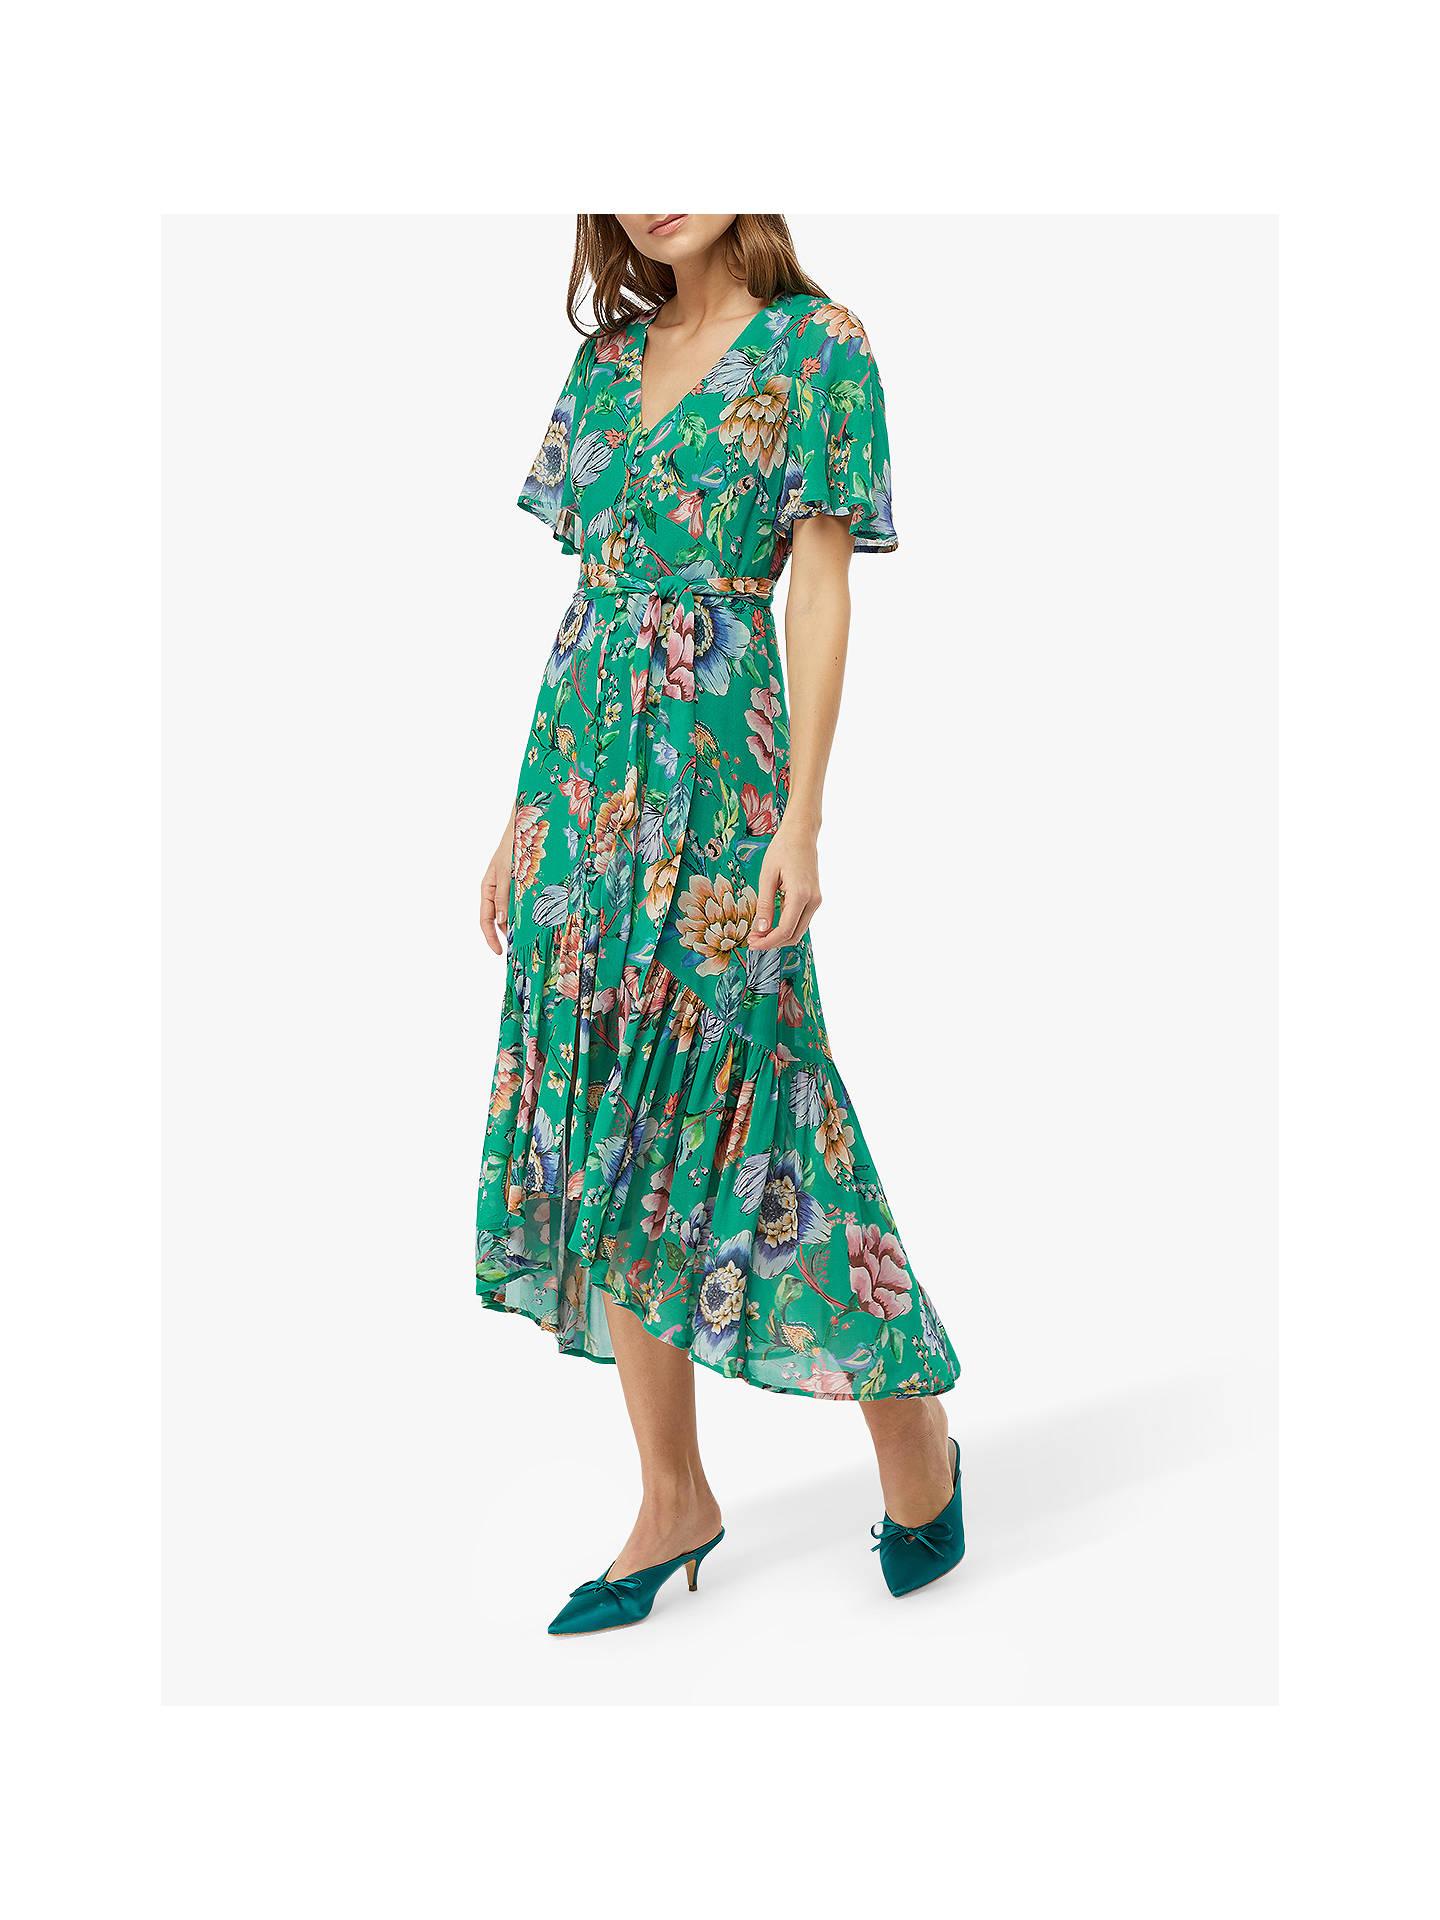 eb5d8eeaef48 Buy Monsoon Alba Print Tea Dress